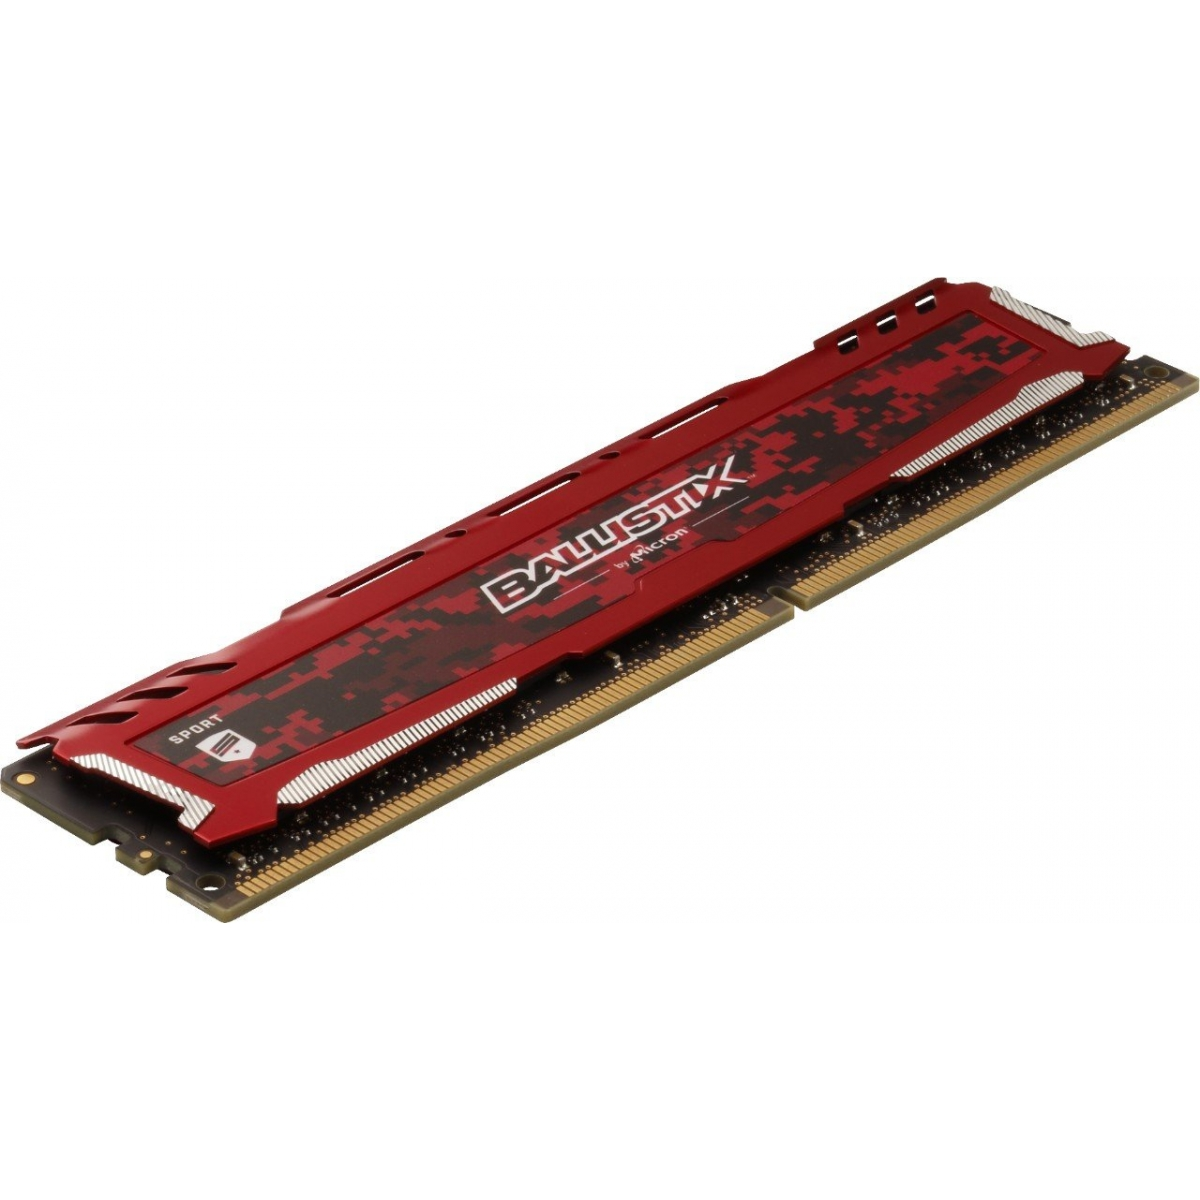 Memória DDR4 Crucial Ballistix Sport Lt, 16GB 3000MHz, Red, BLS16G4D30AESE